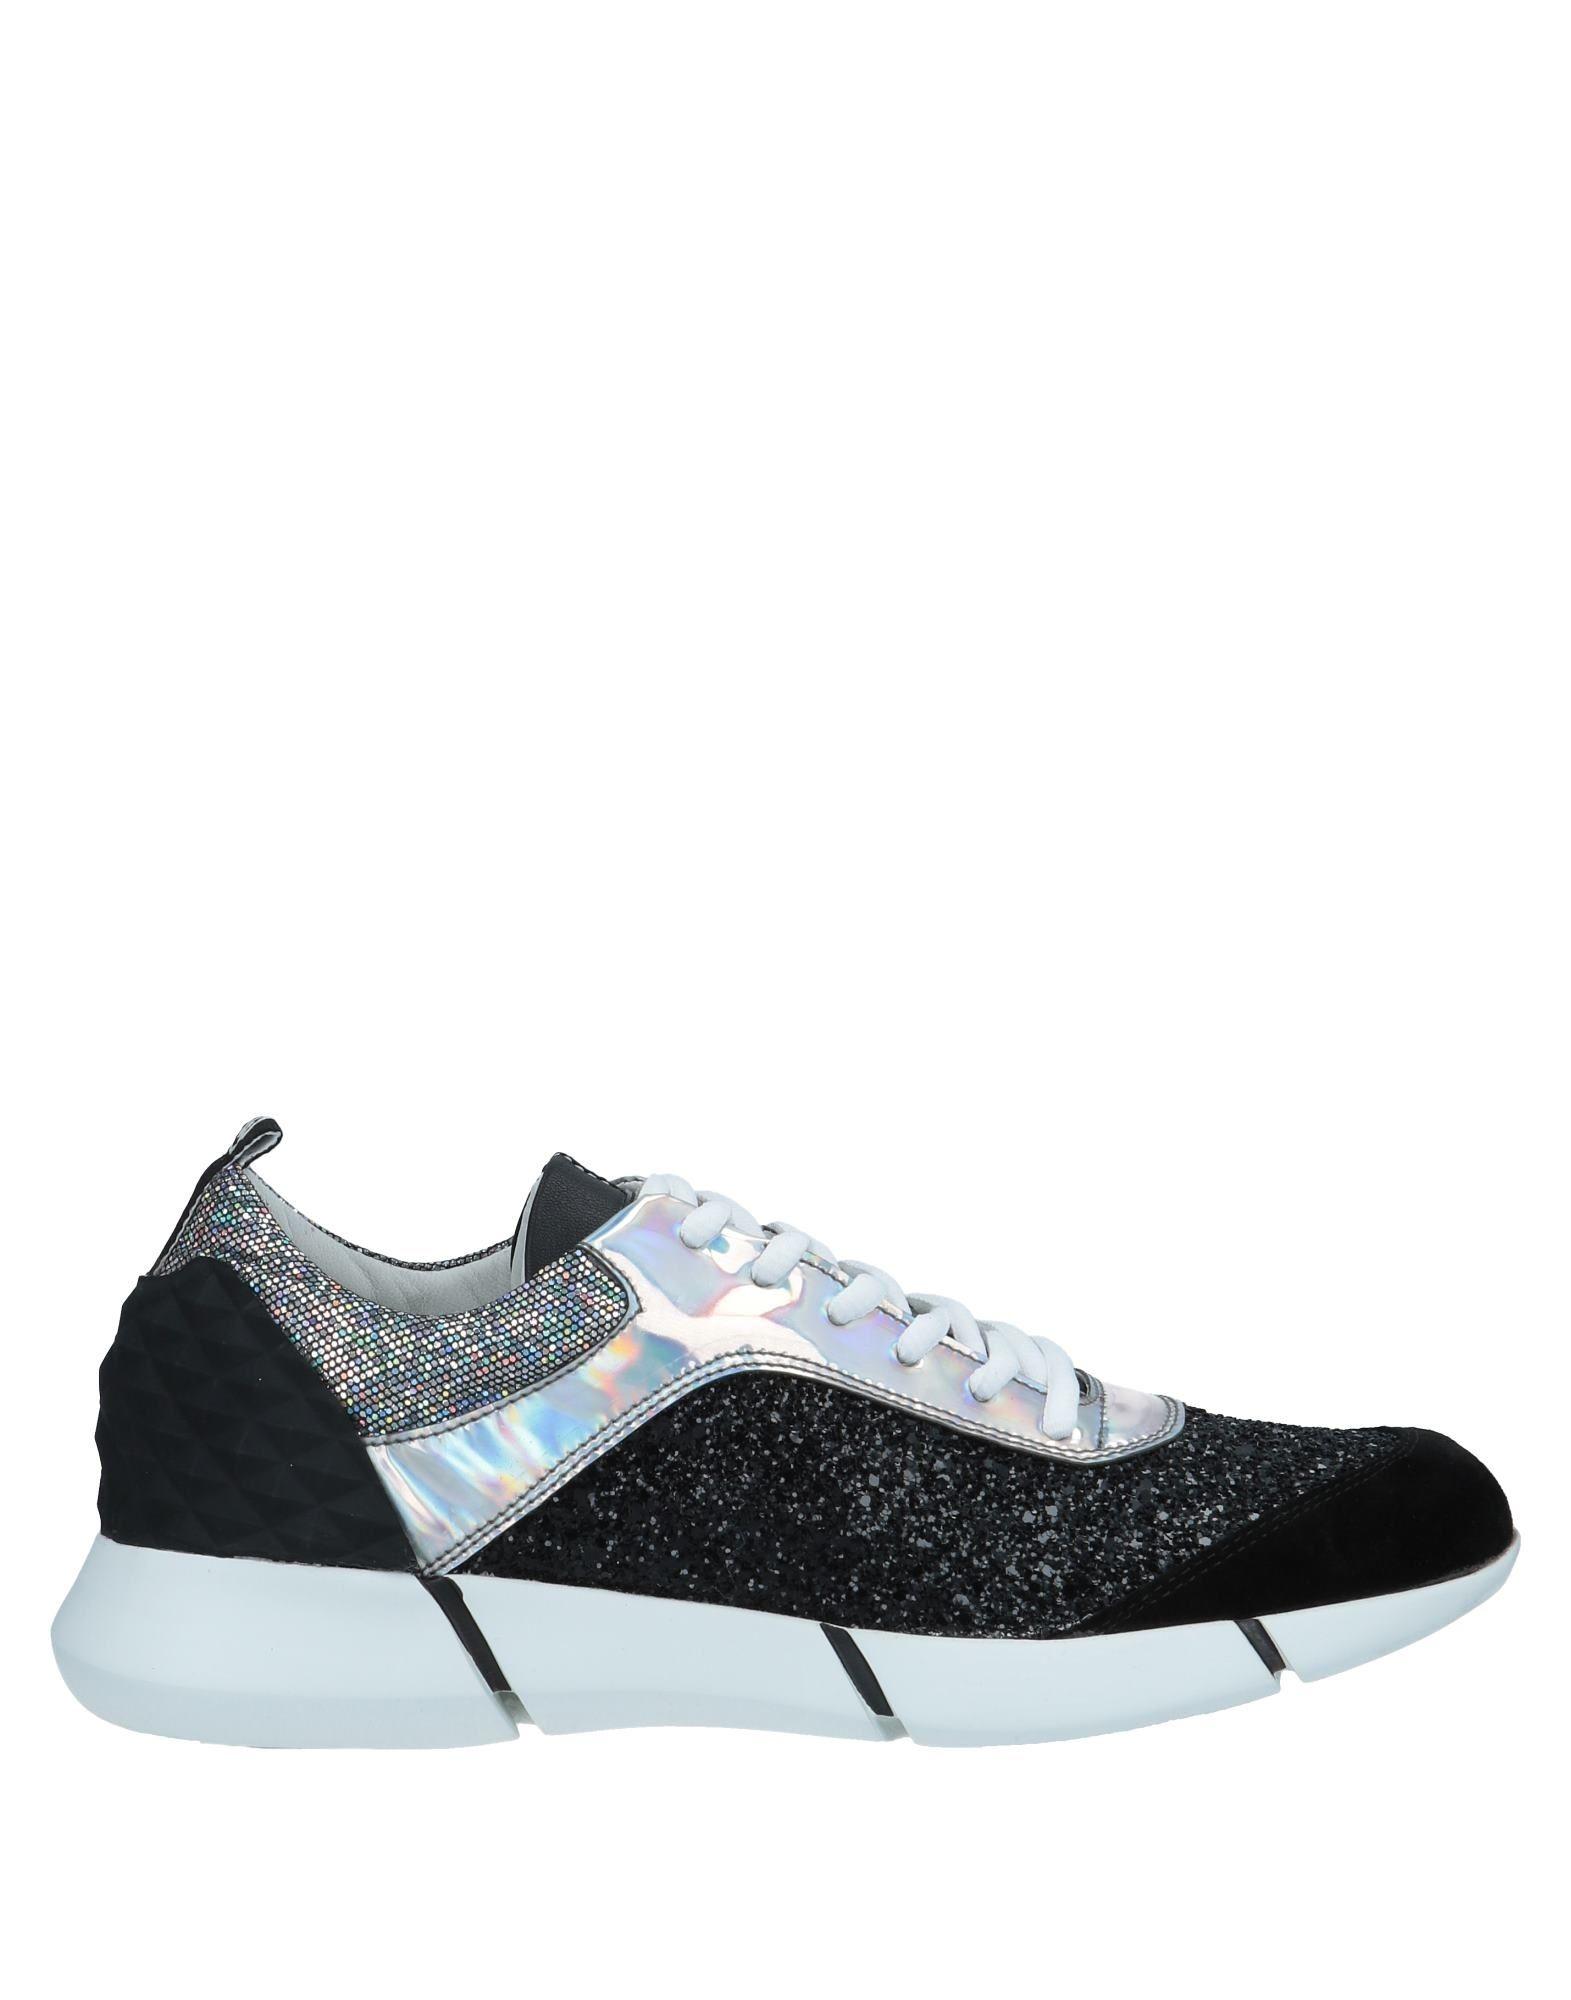 Elena Elena Iachi Sneakers - Men Elena Elena Iachi Sneakers online on  Australia - 11570333KB 3d62e2